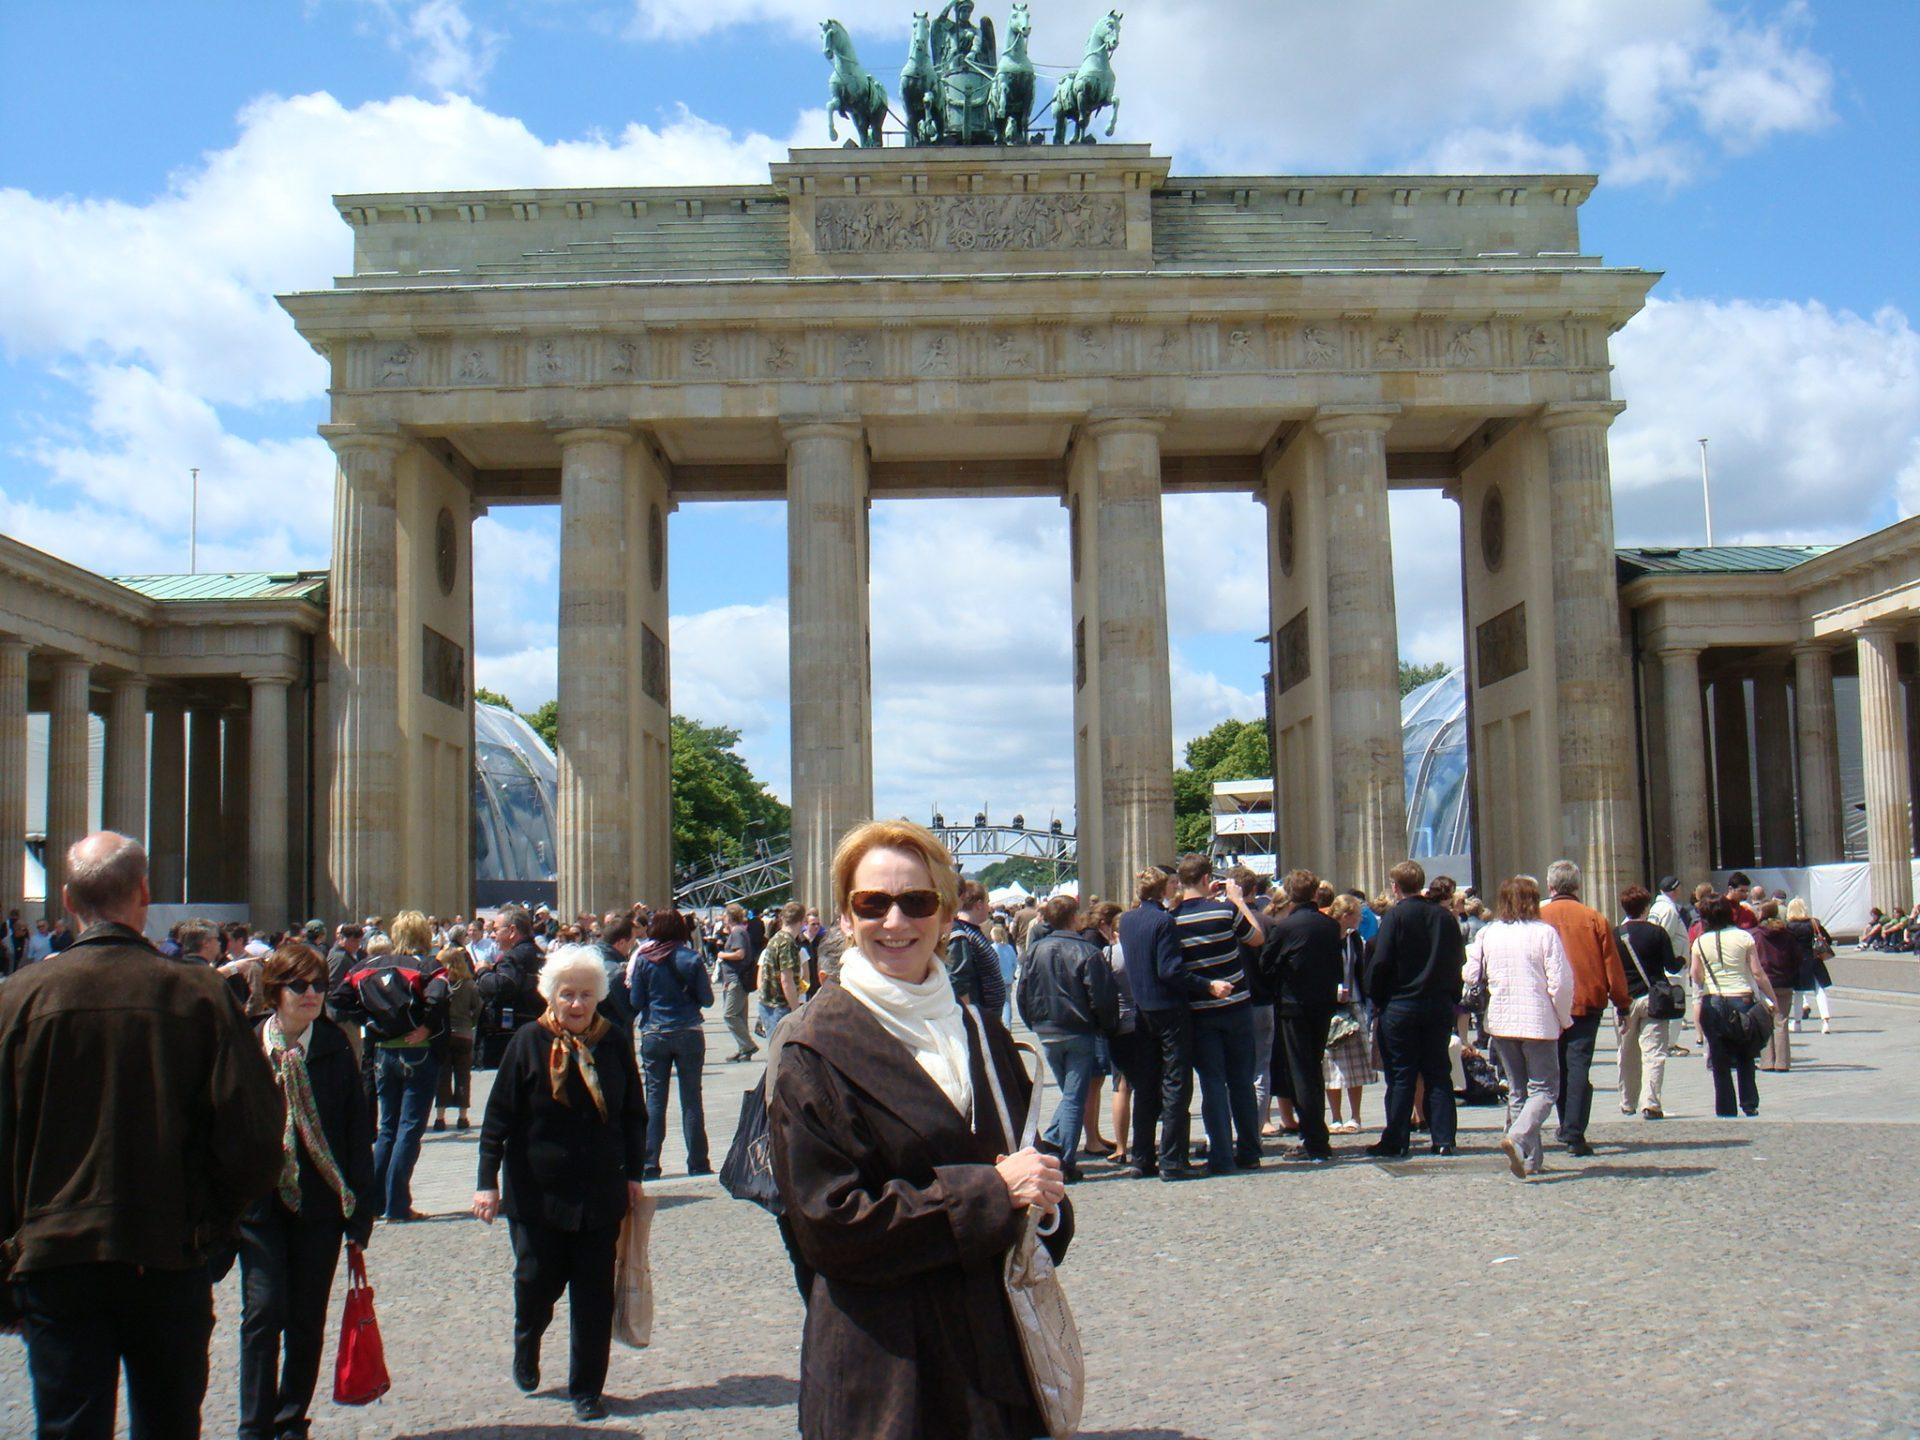 Me, celebrating freedom under the Brandenburg Gate